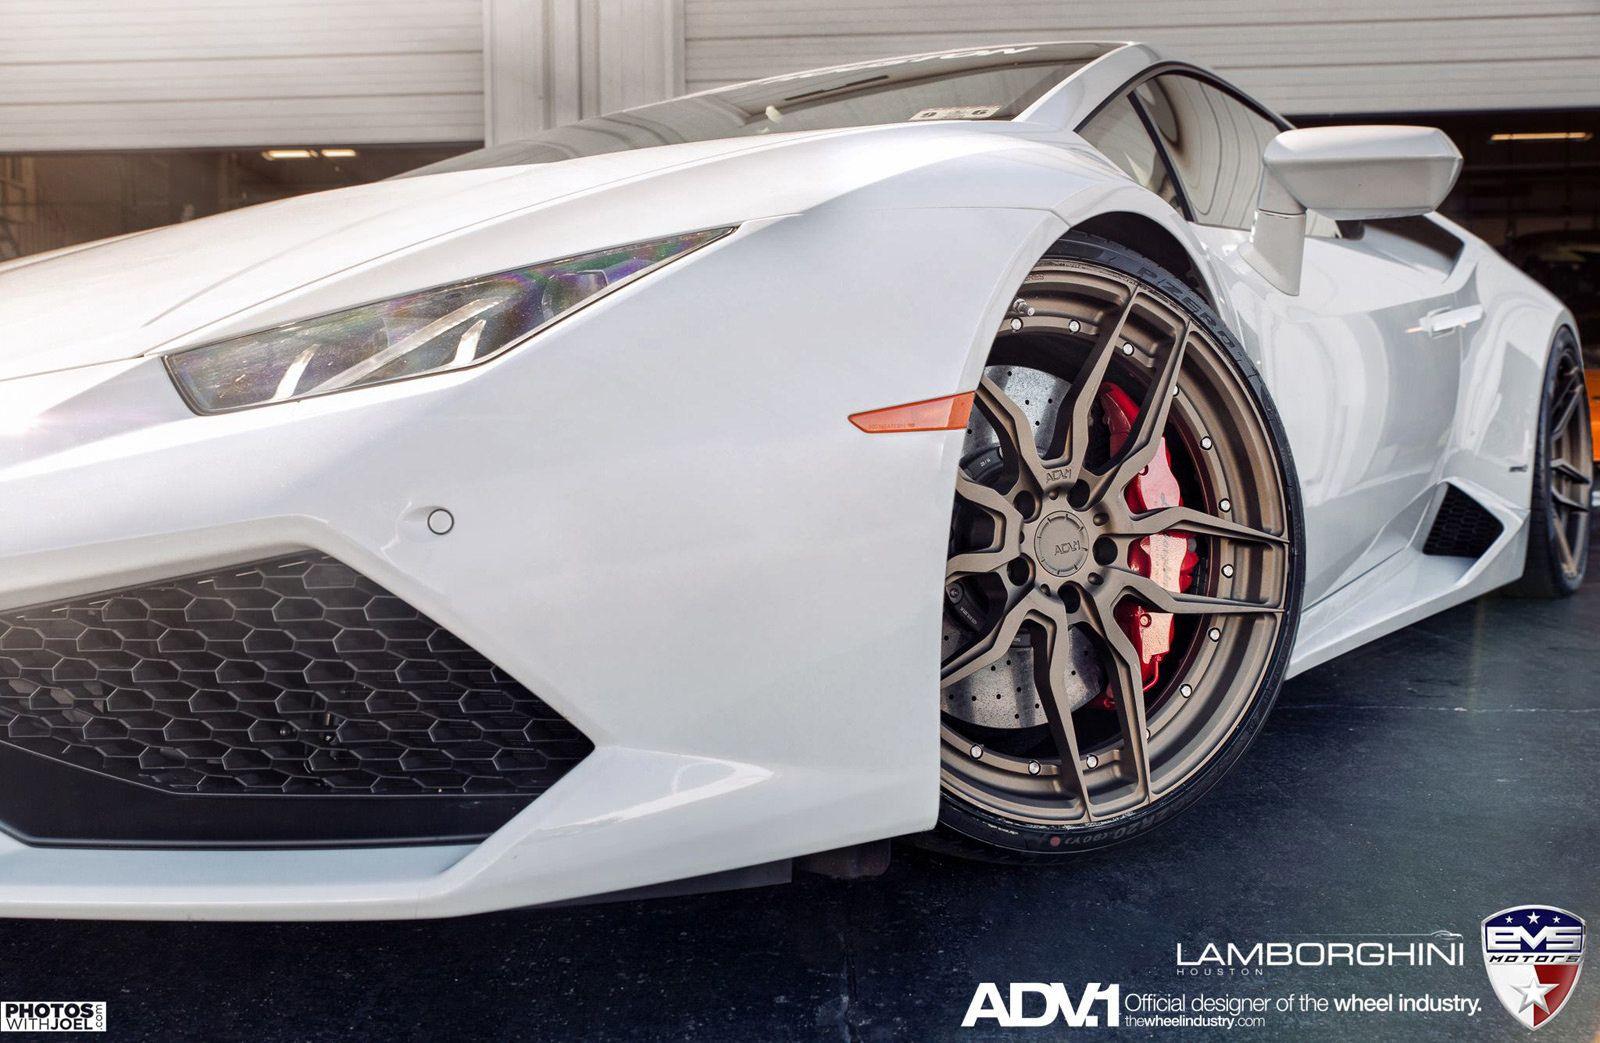 Branco Lamborghini Huracan em Matte Bronze ADV.1 Wheels lado da frente fechar-se